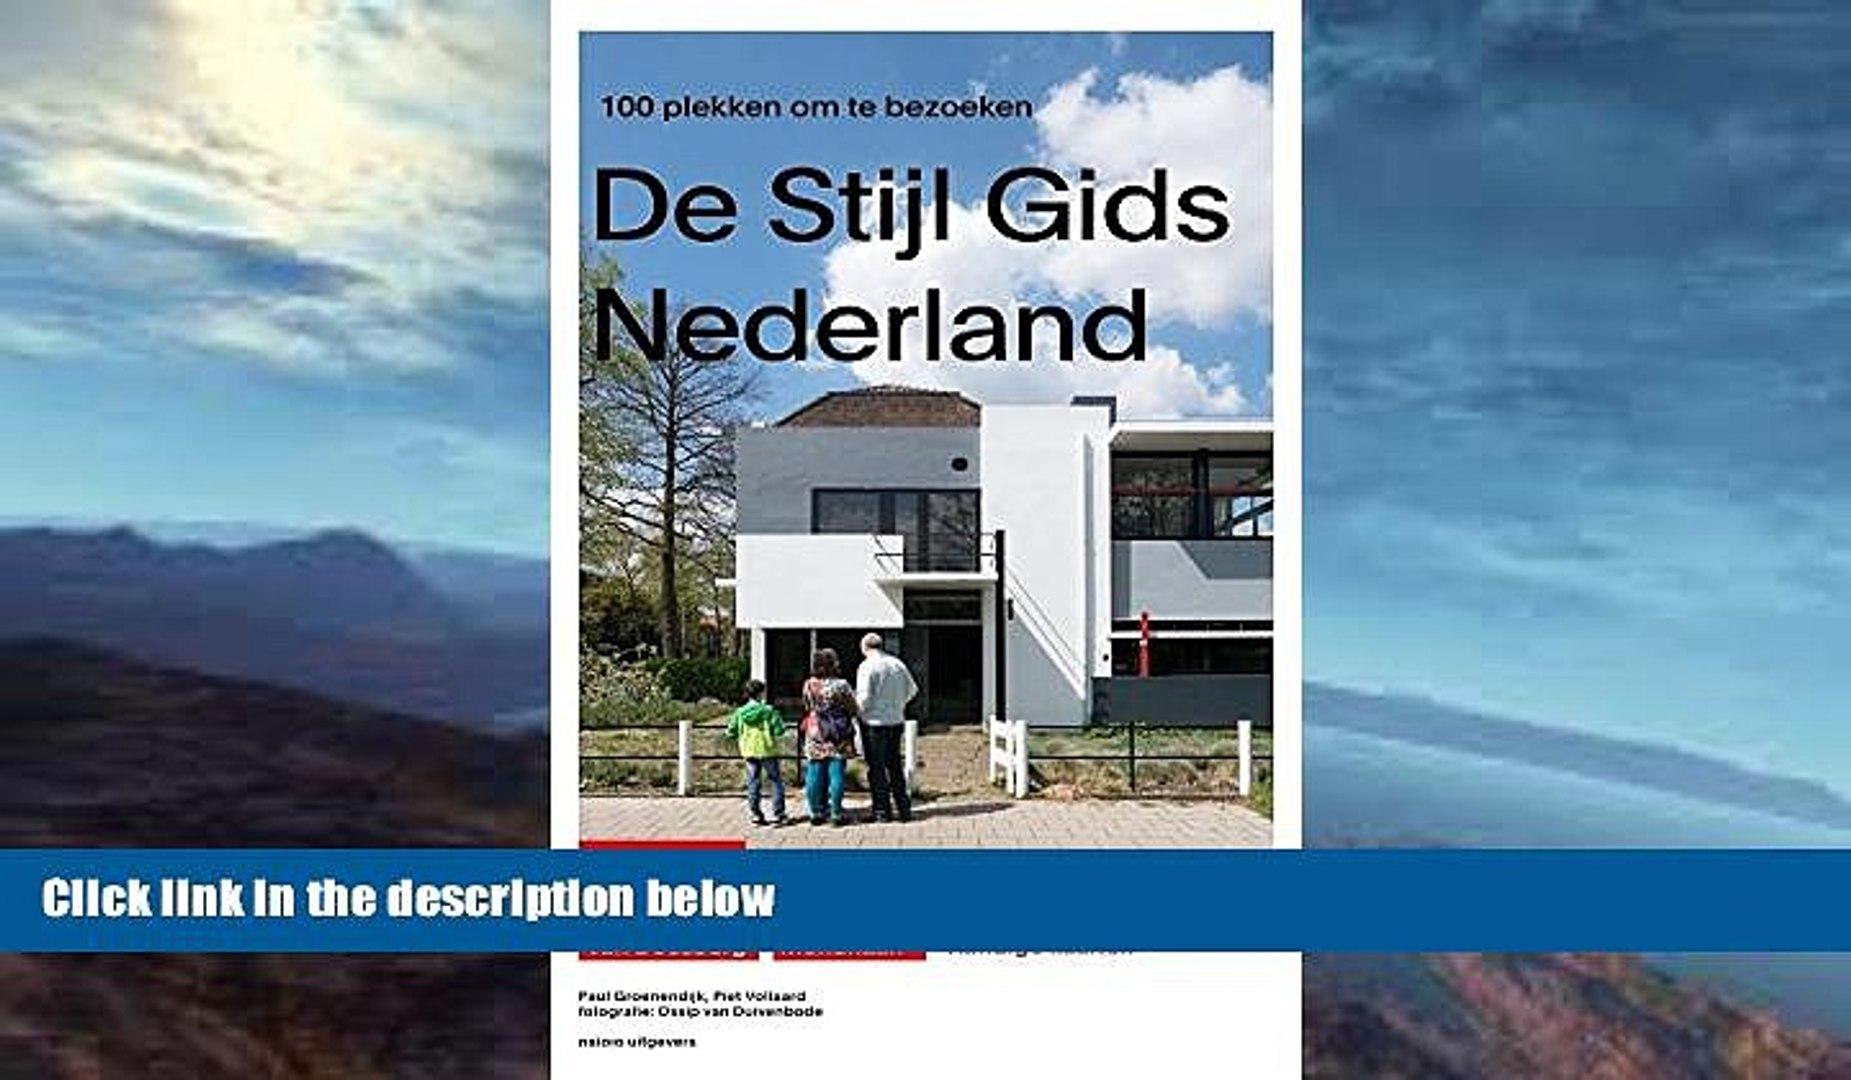 Best Price Guide to De Stijl in the Netherlands: The 100 Best Spots to Visit Paul Groenendijk For